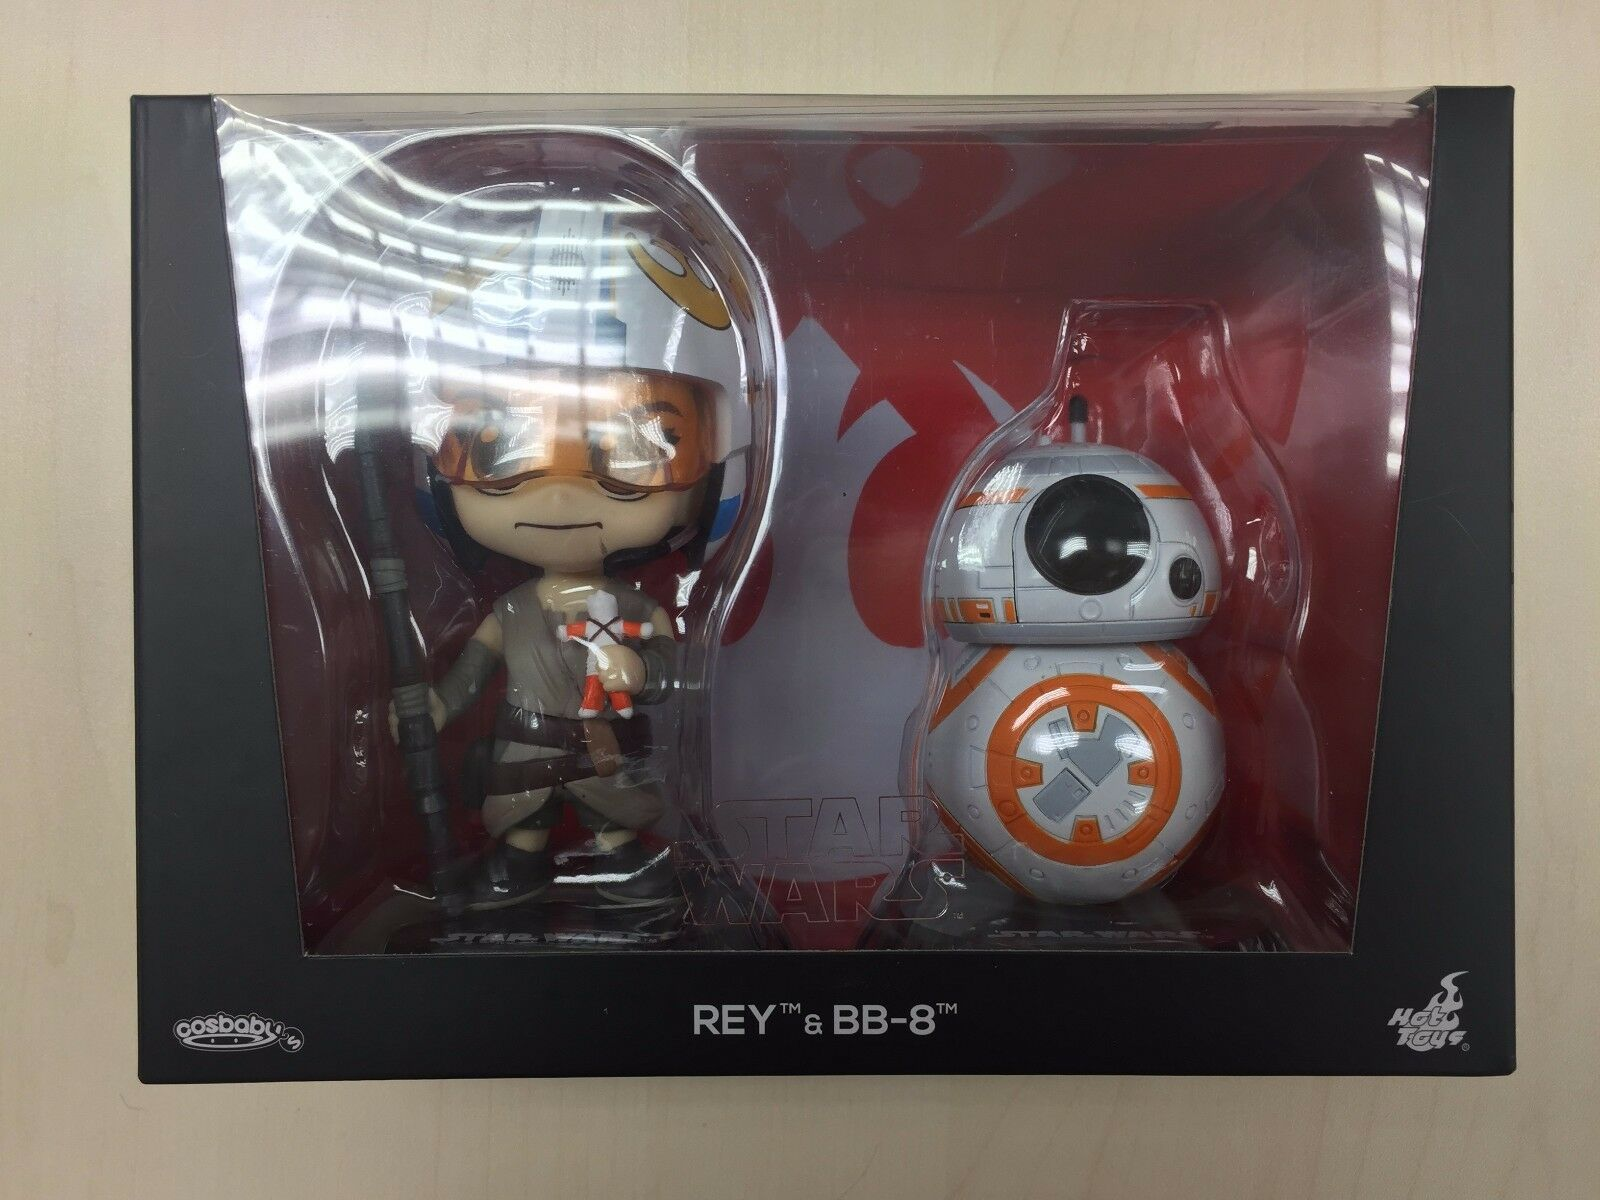 Hot Toys COS 404 Cosbaby Star Wars Rey (Helmet Version) & BB-8 Set NEW